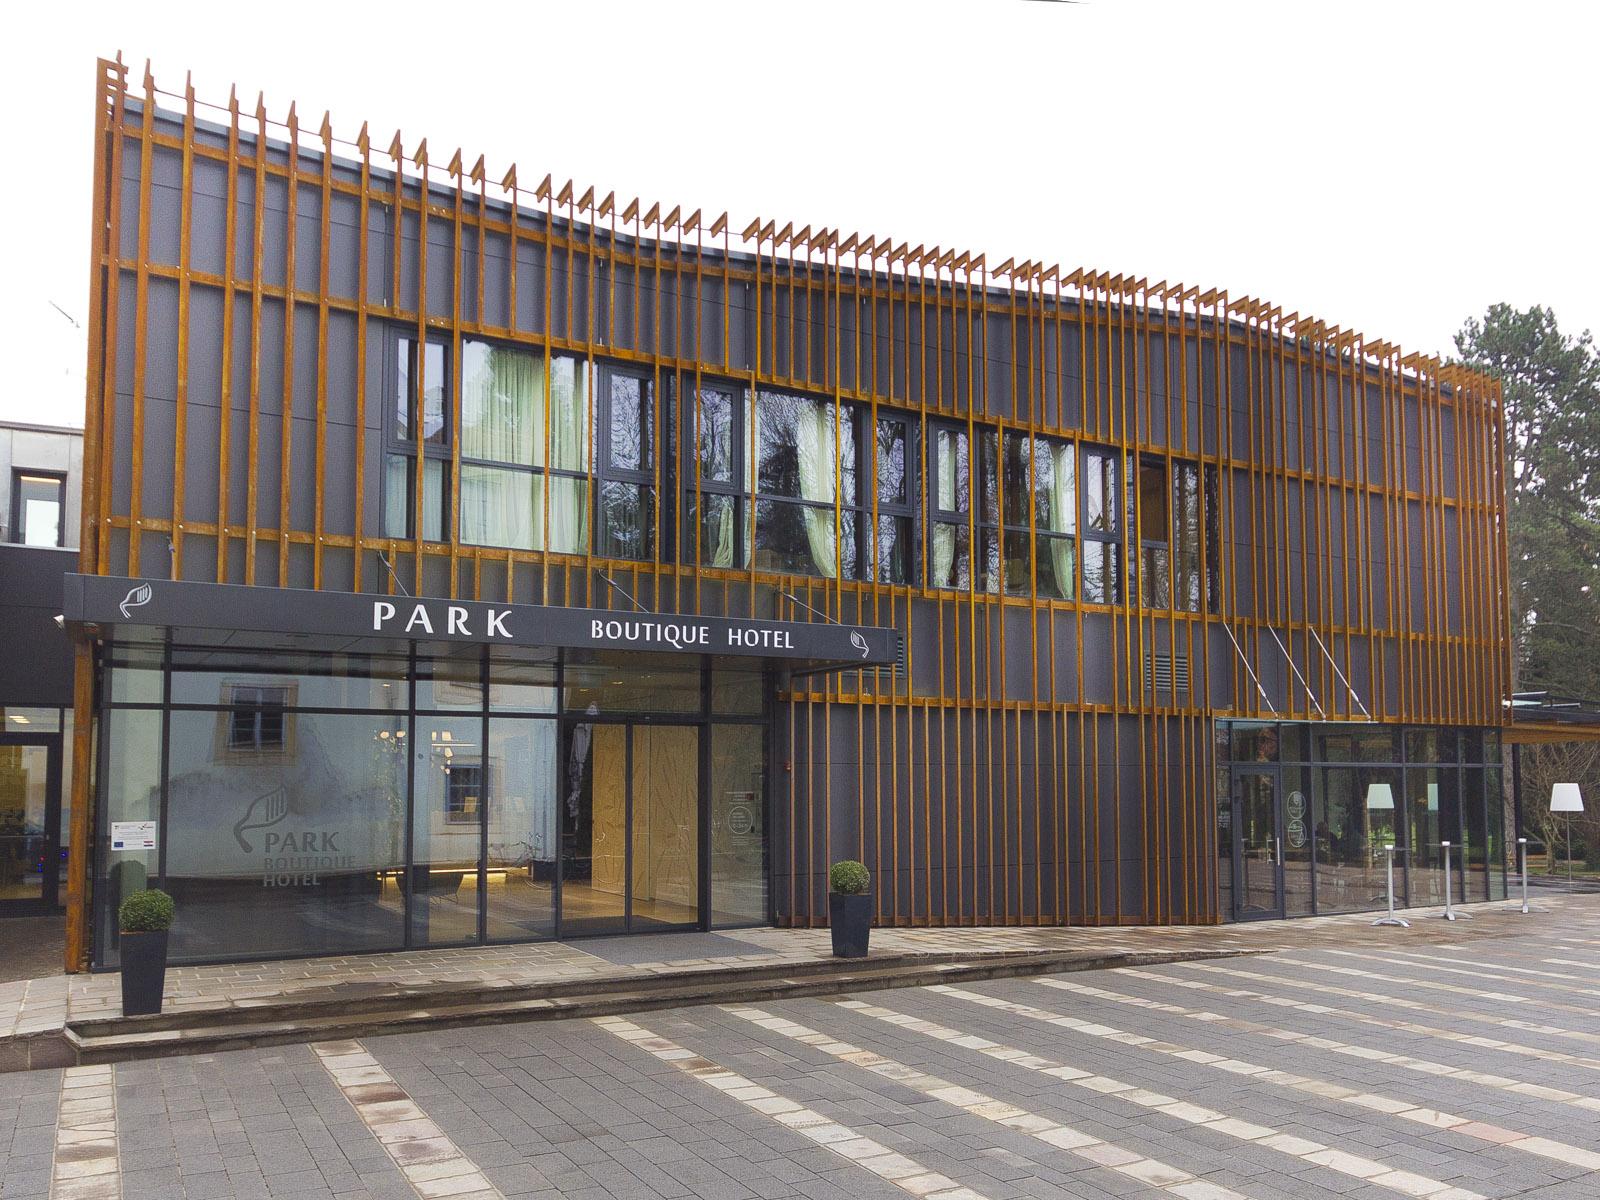 Park_9-12-2015-vanjske-zbor_02